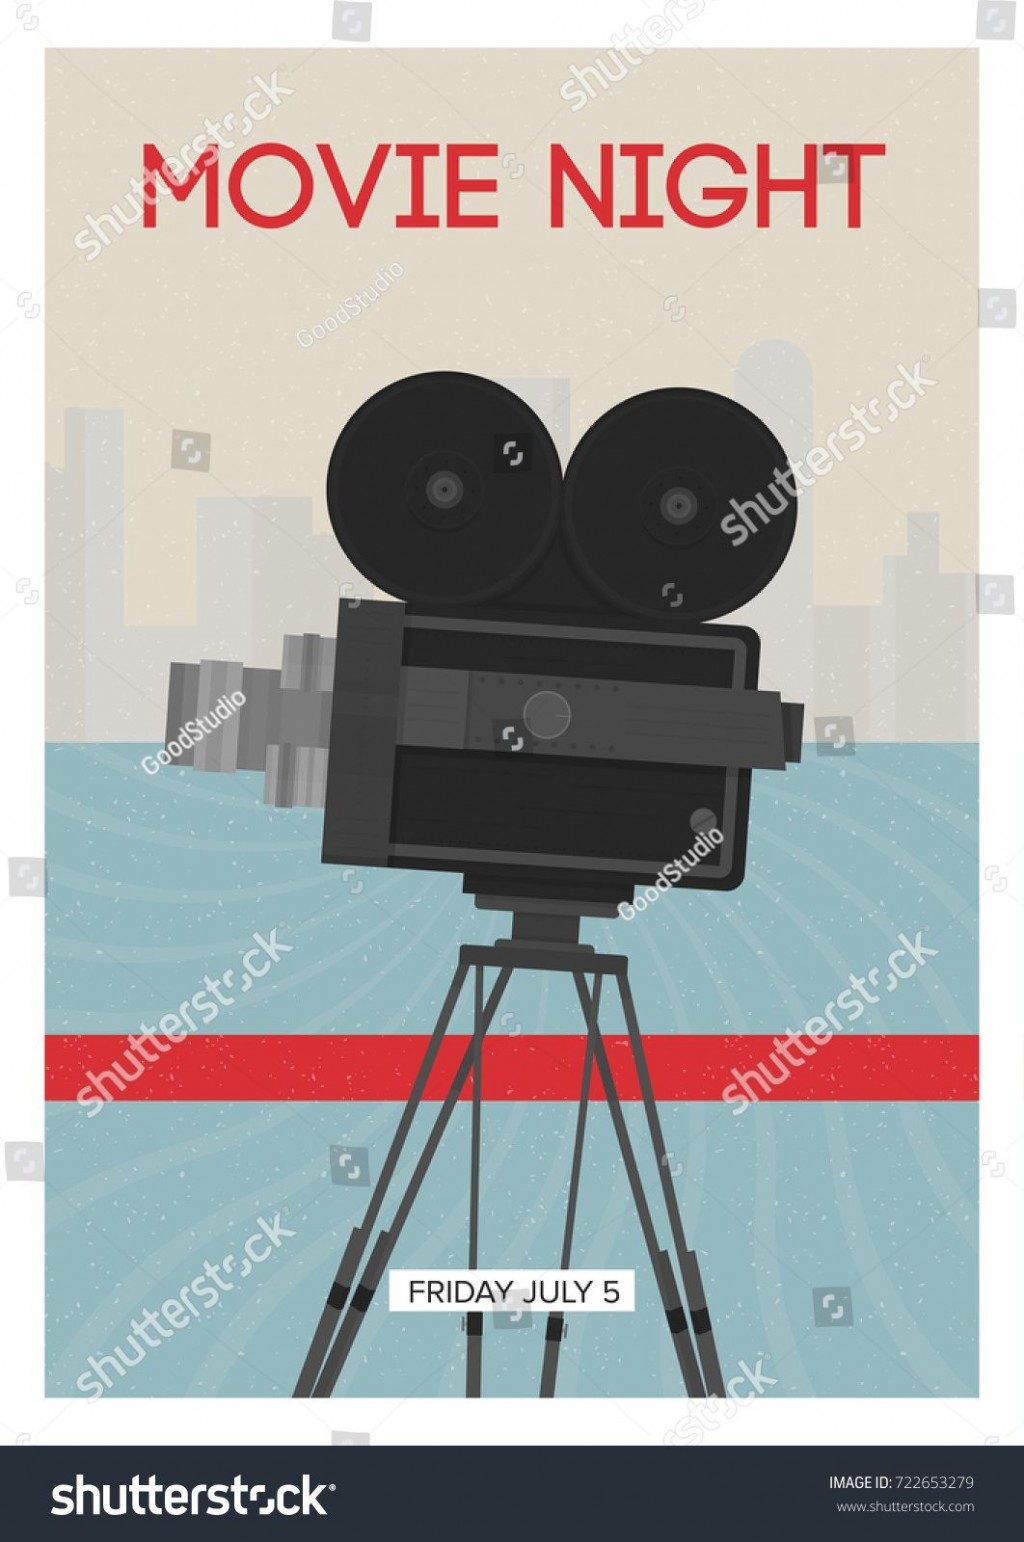 008 Wondrou Movie Night Flyer Template High Resolution  Templates Free Microsoft WordLarge